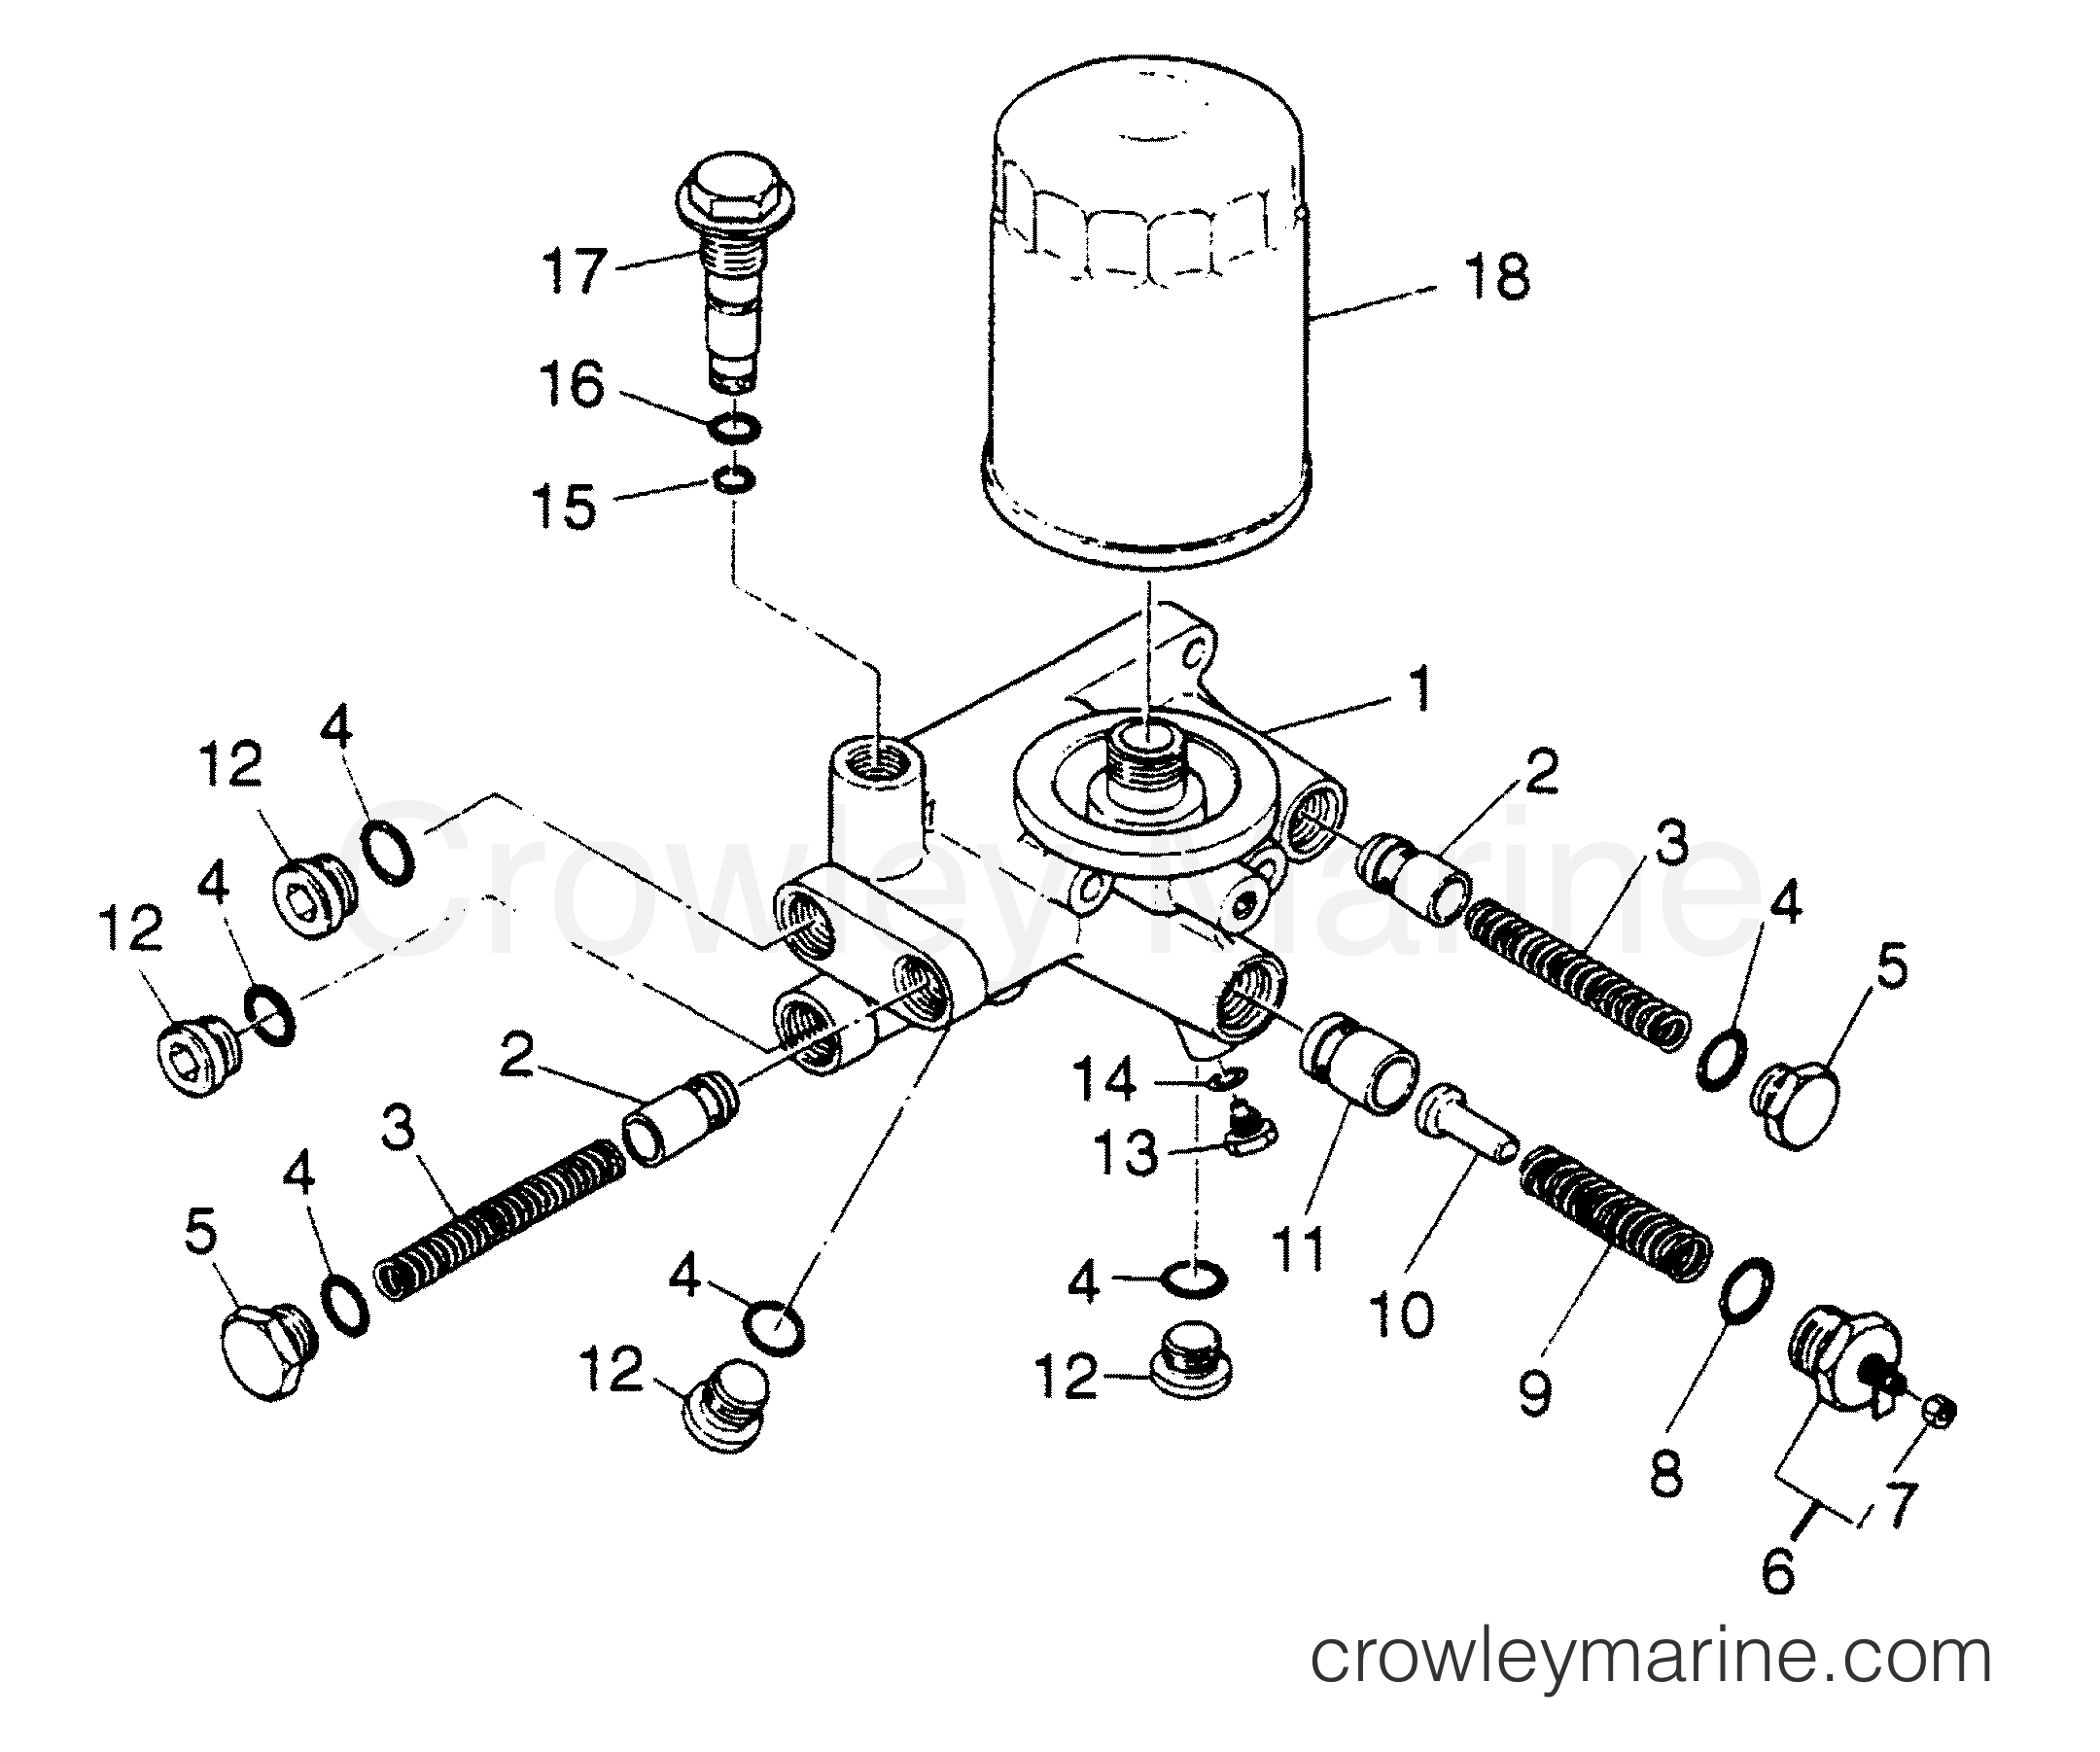 filter assembly - oil